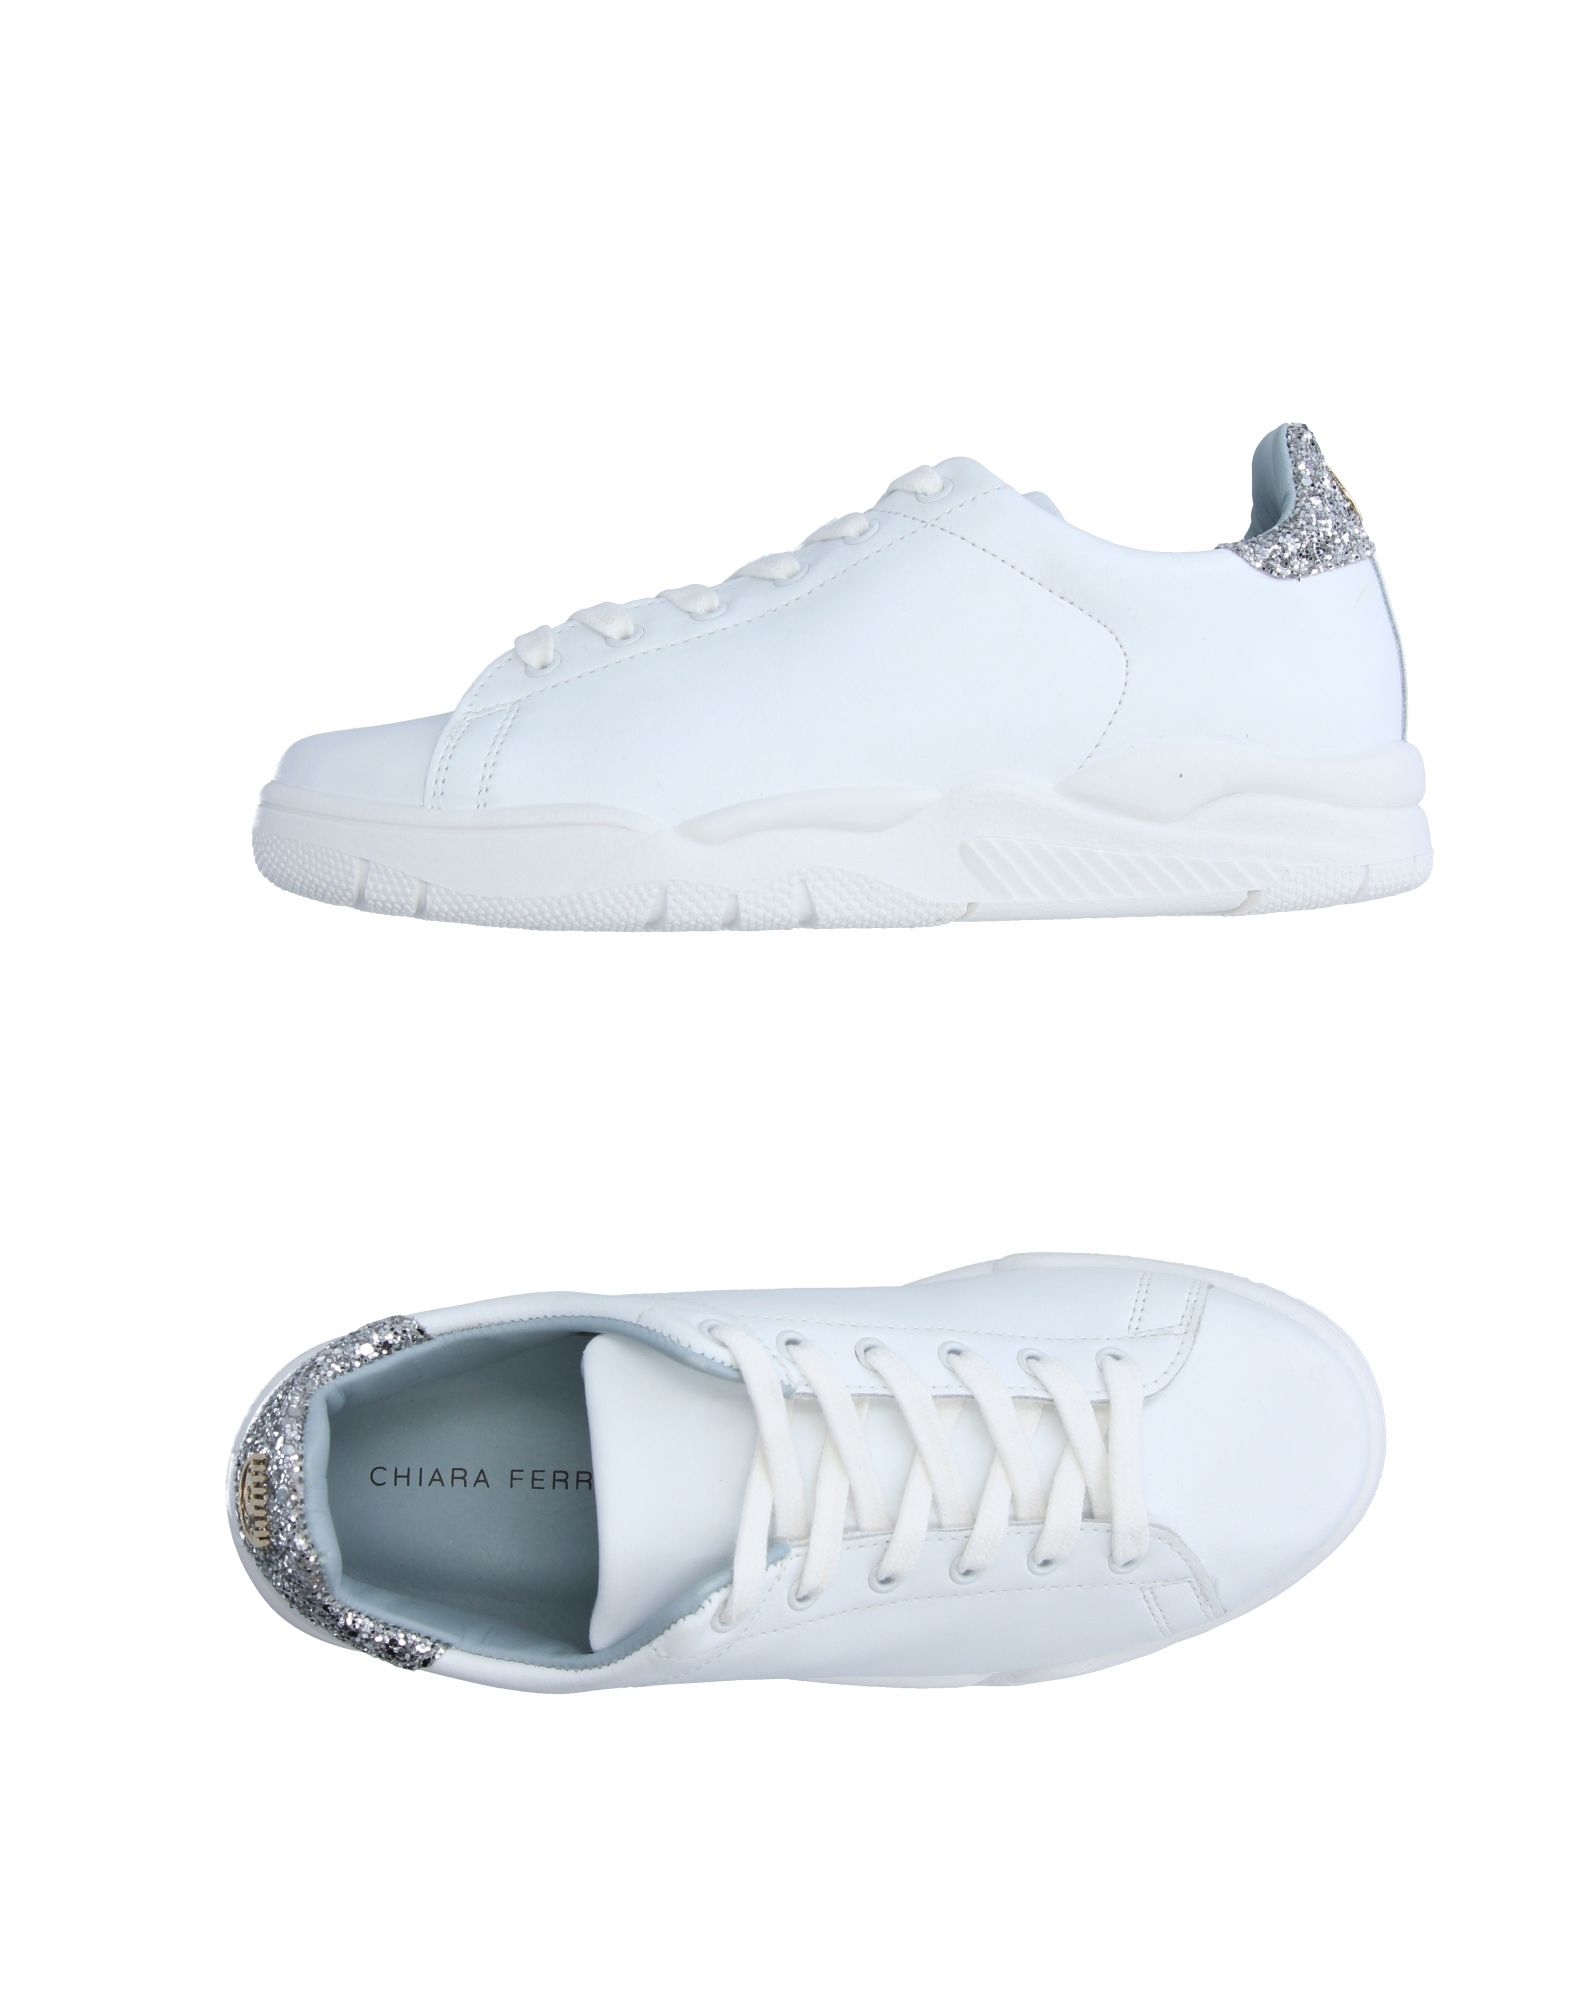 Chiara 11212237GF Ferragni Sneakers Damen  11212237GF Chiara Neue Schuhe 47fd12